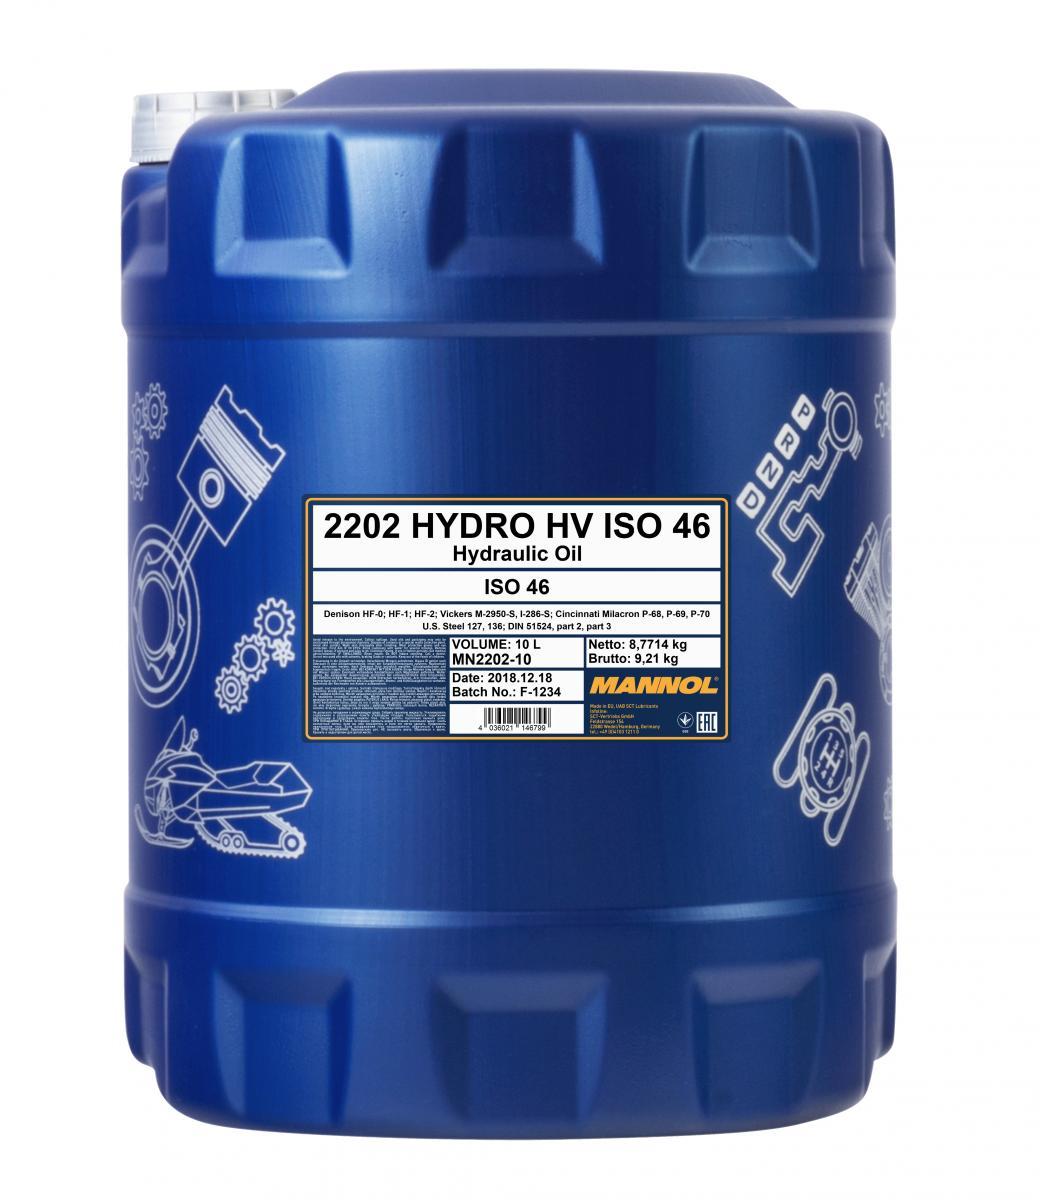 Hydro HV ISO 46